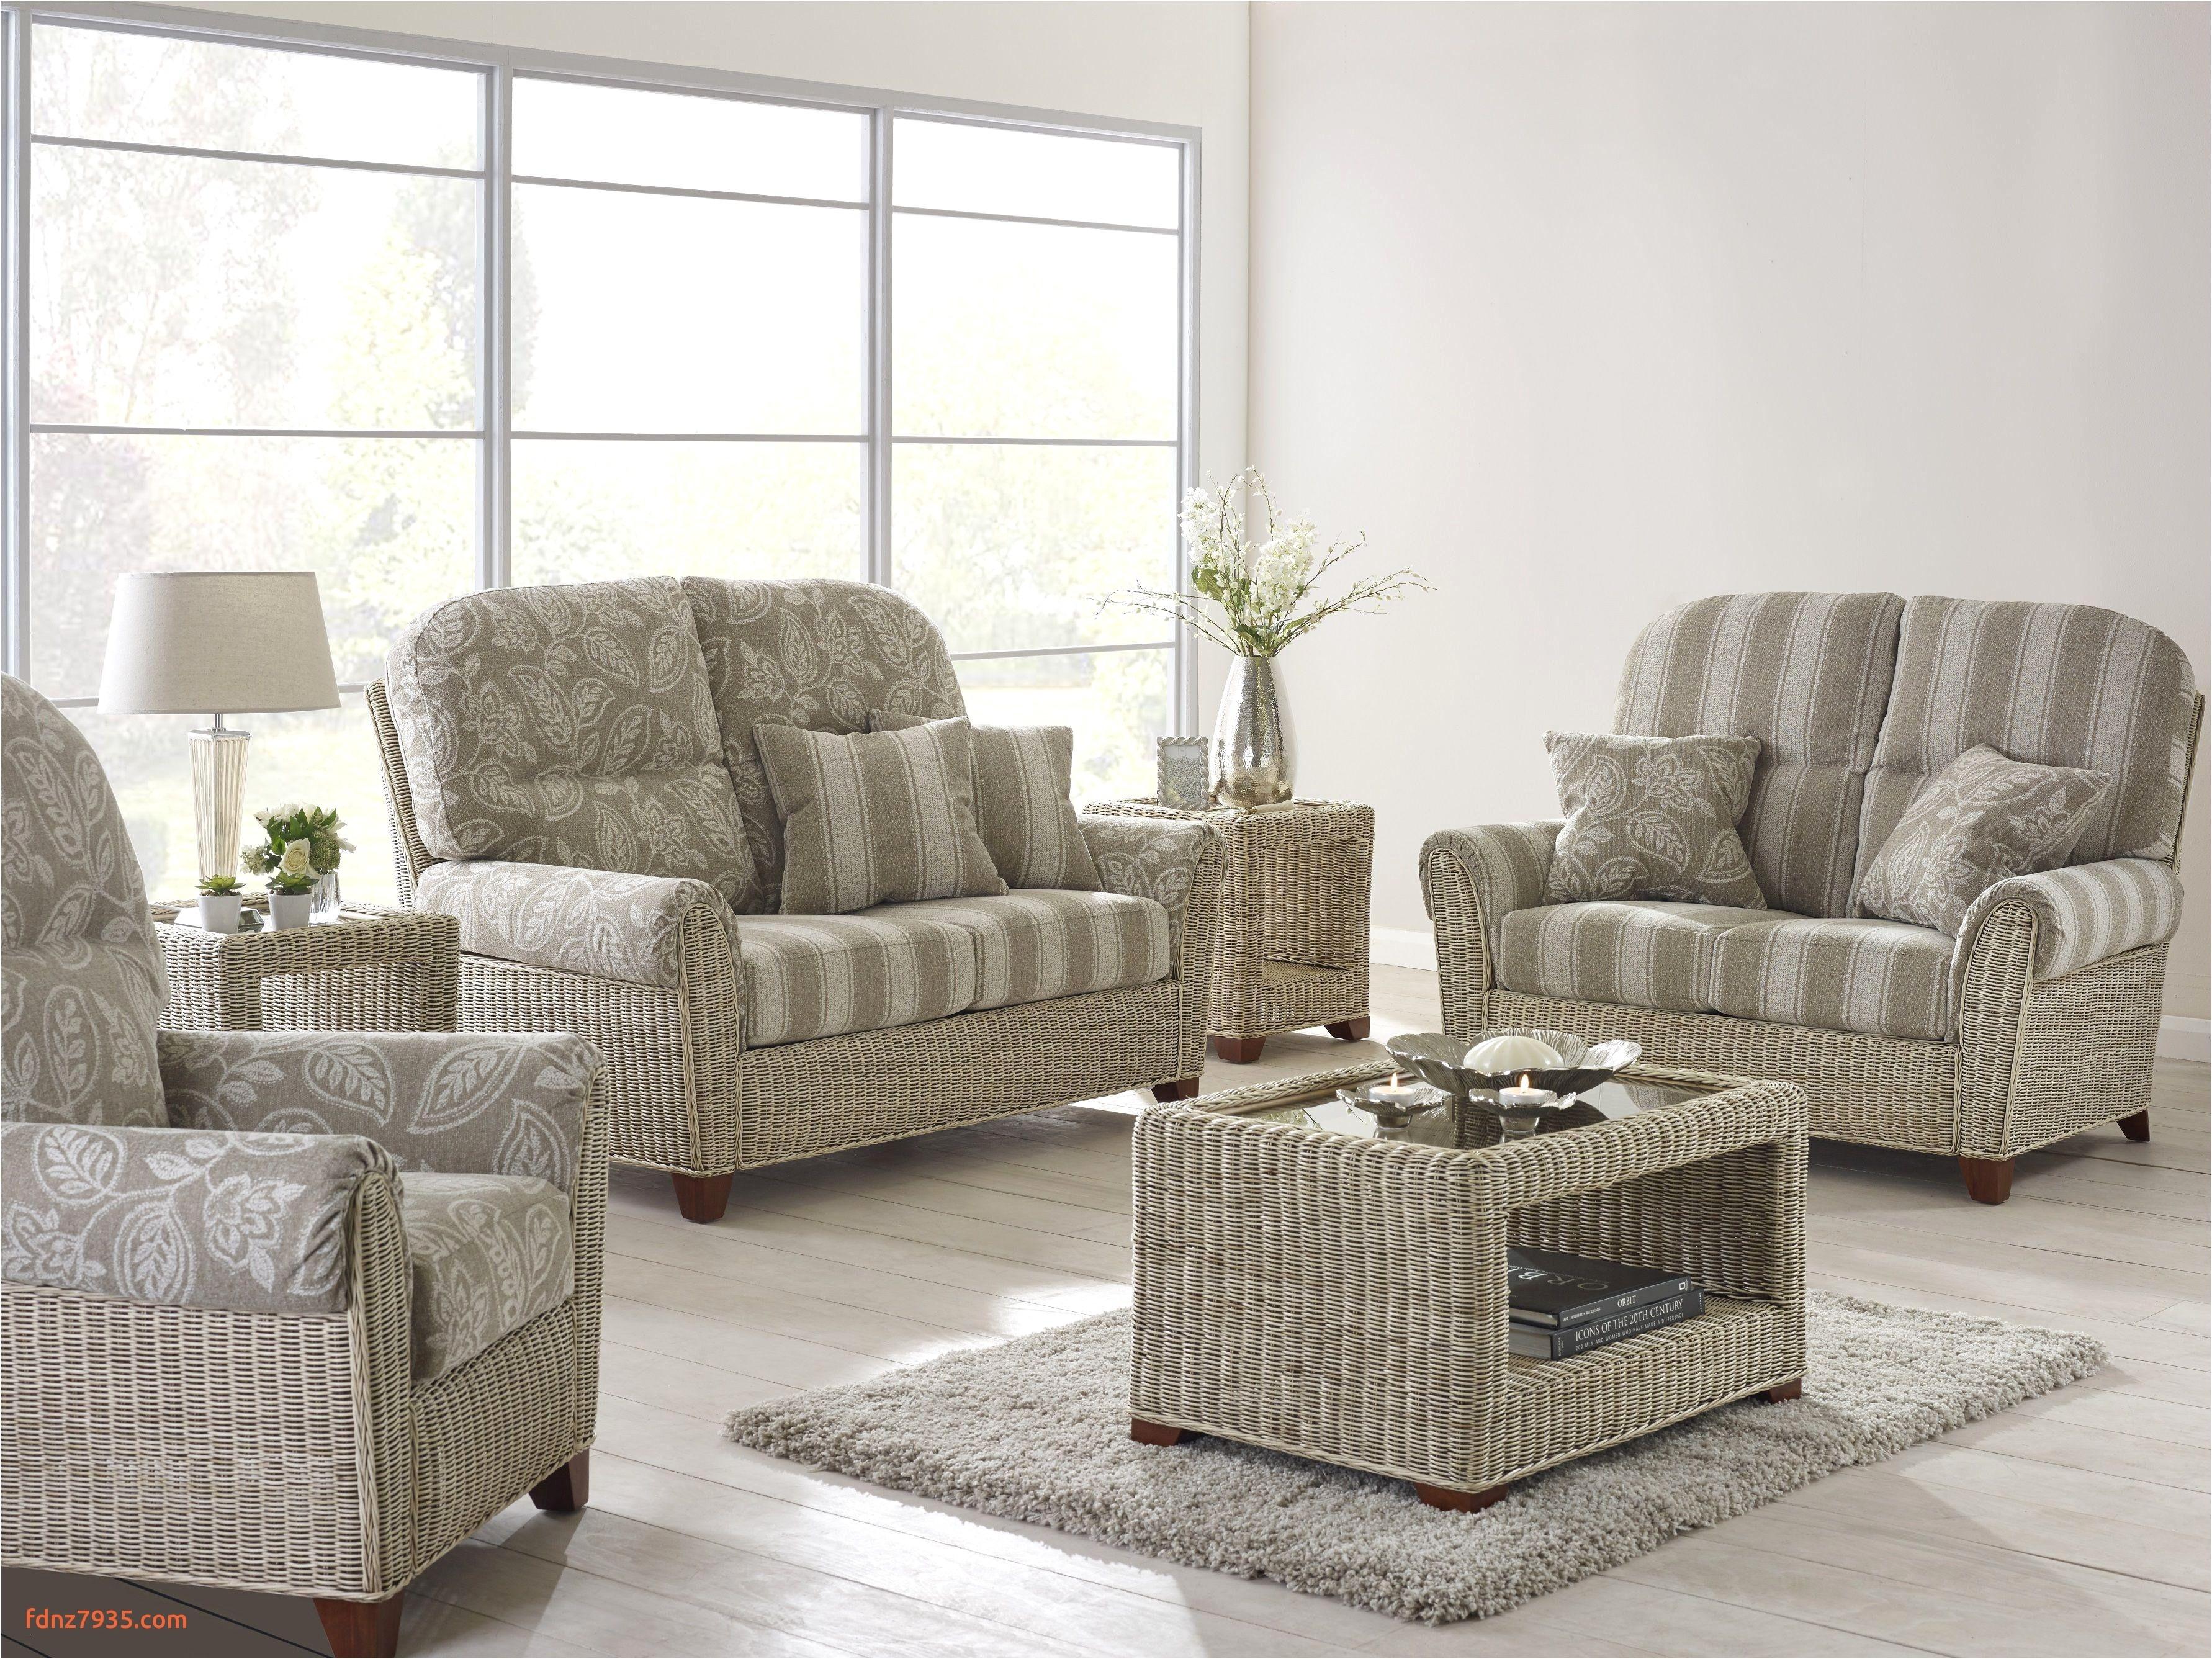 11 Enchanting Affordable Sleeper sofa graphs